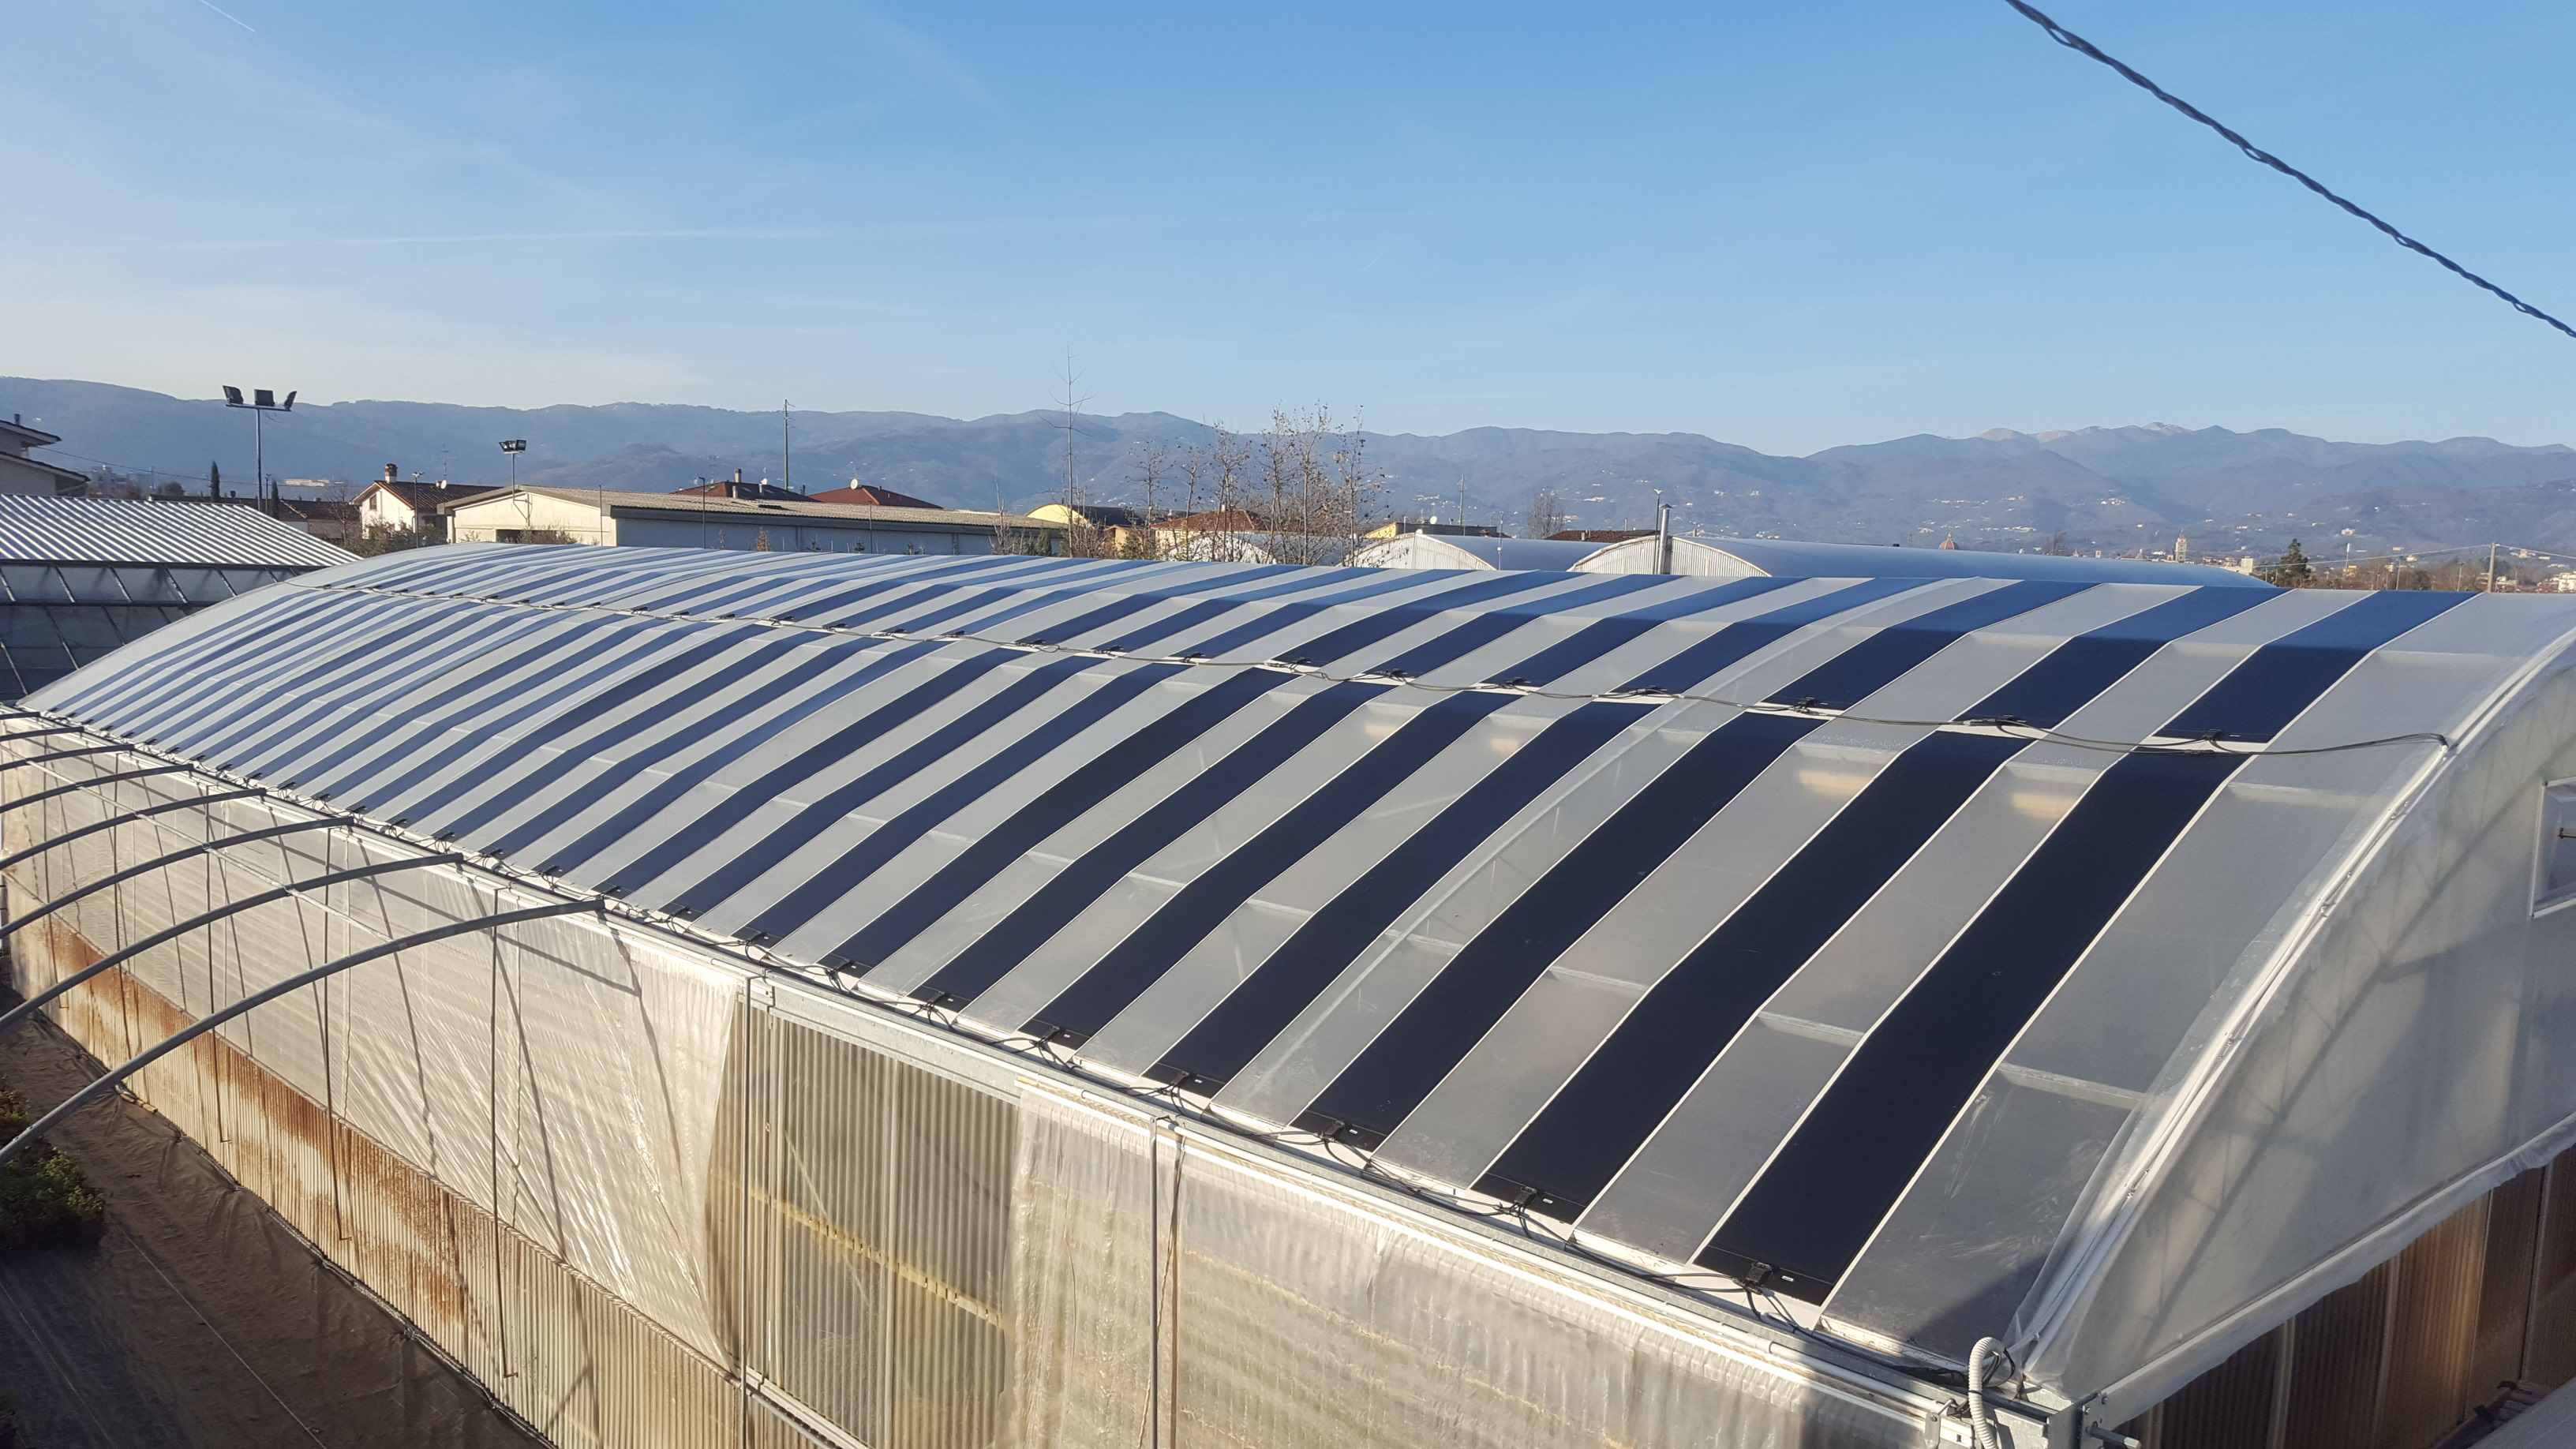 Flisom's lightweight, jet black and ultra-thin, flexible solar panels